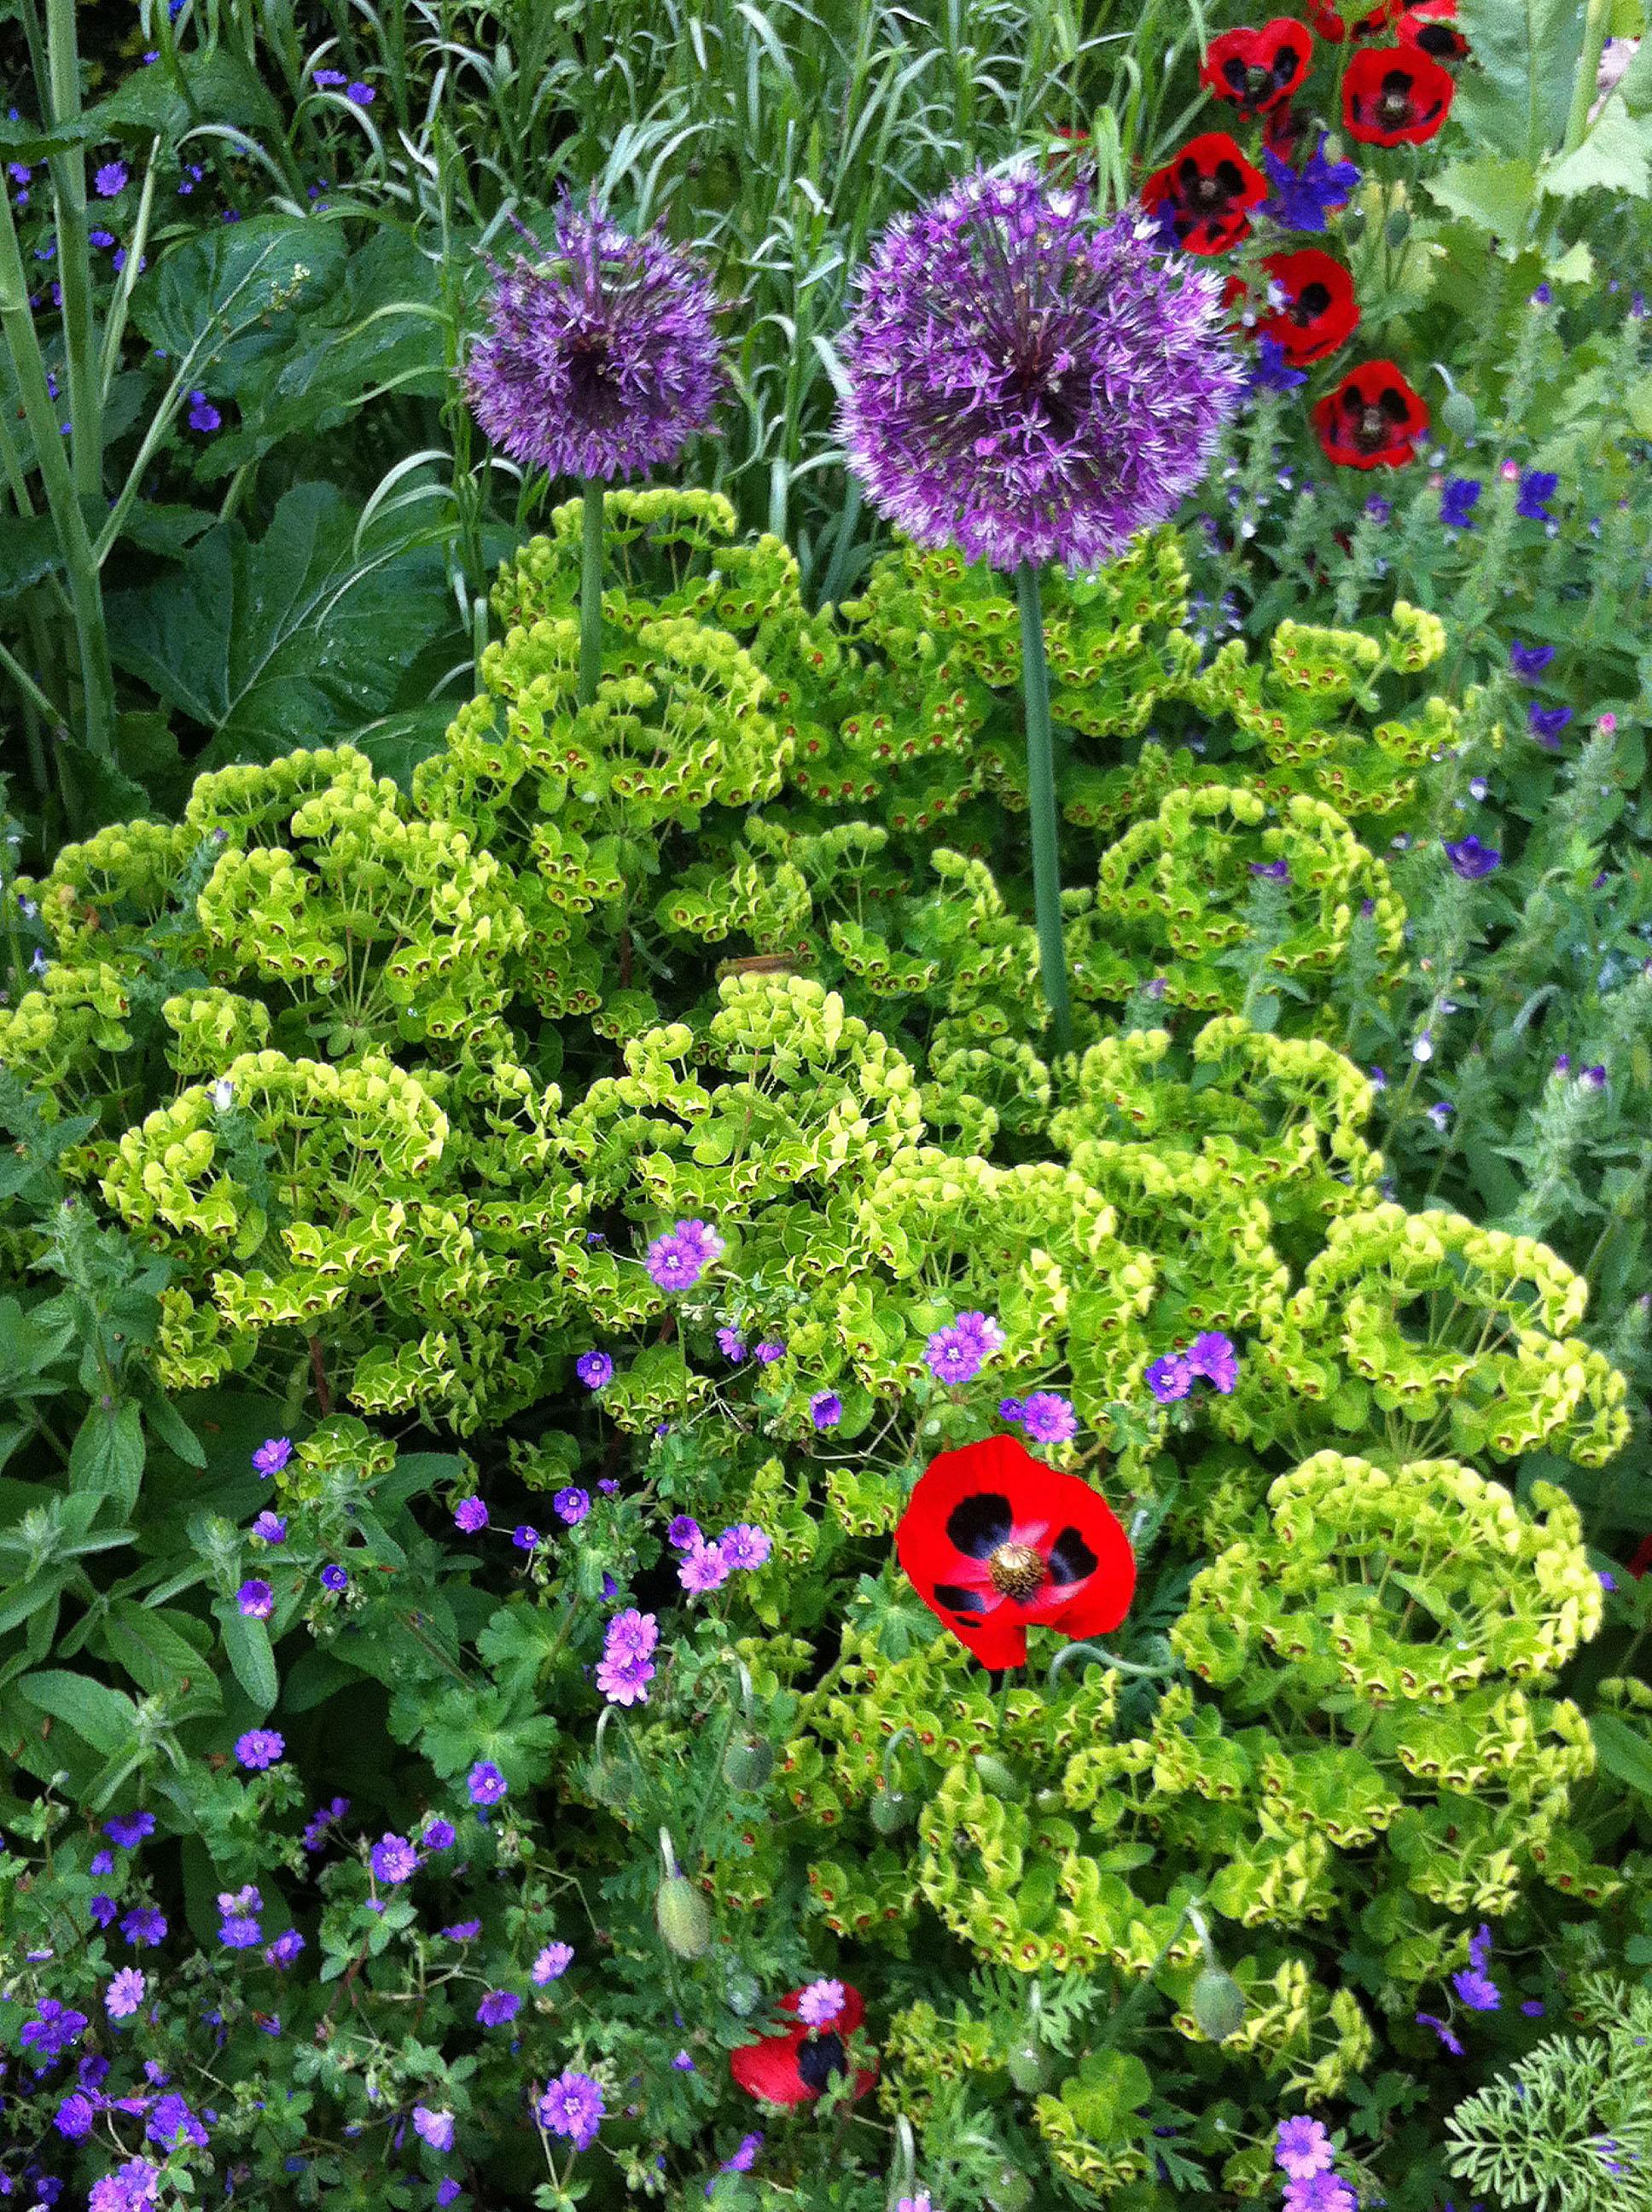 Eleaner and philip s garden outer space garden design for Outer space garden design